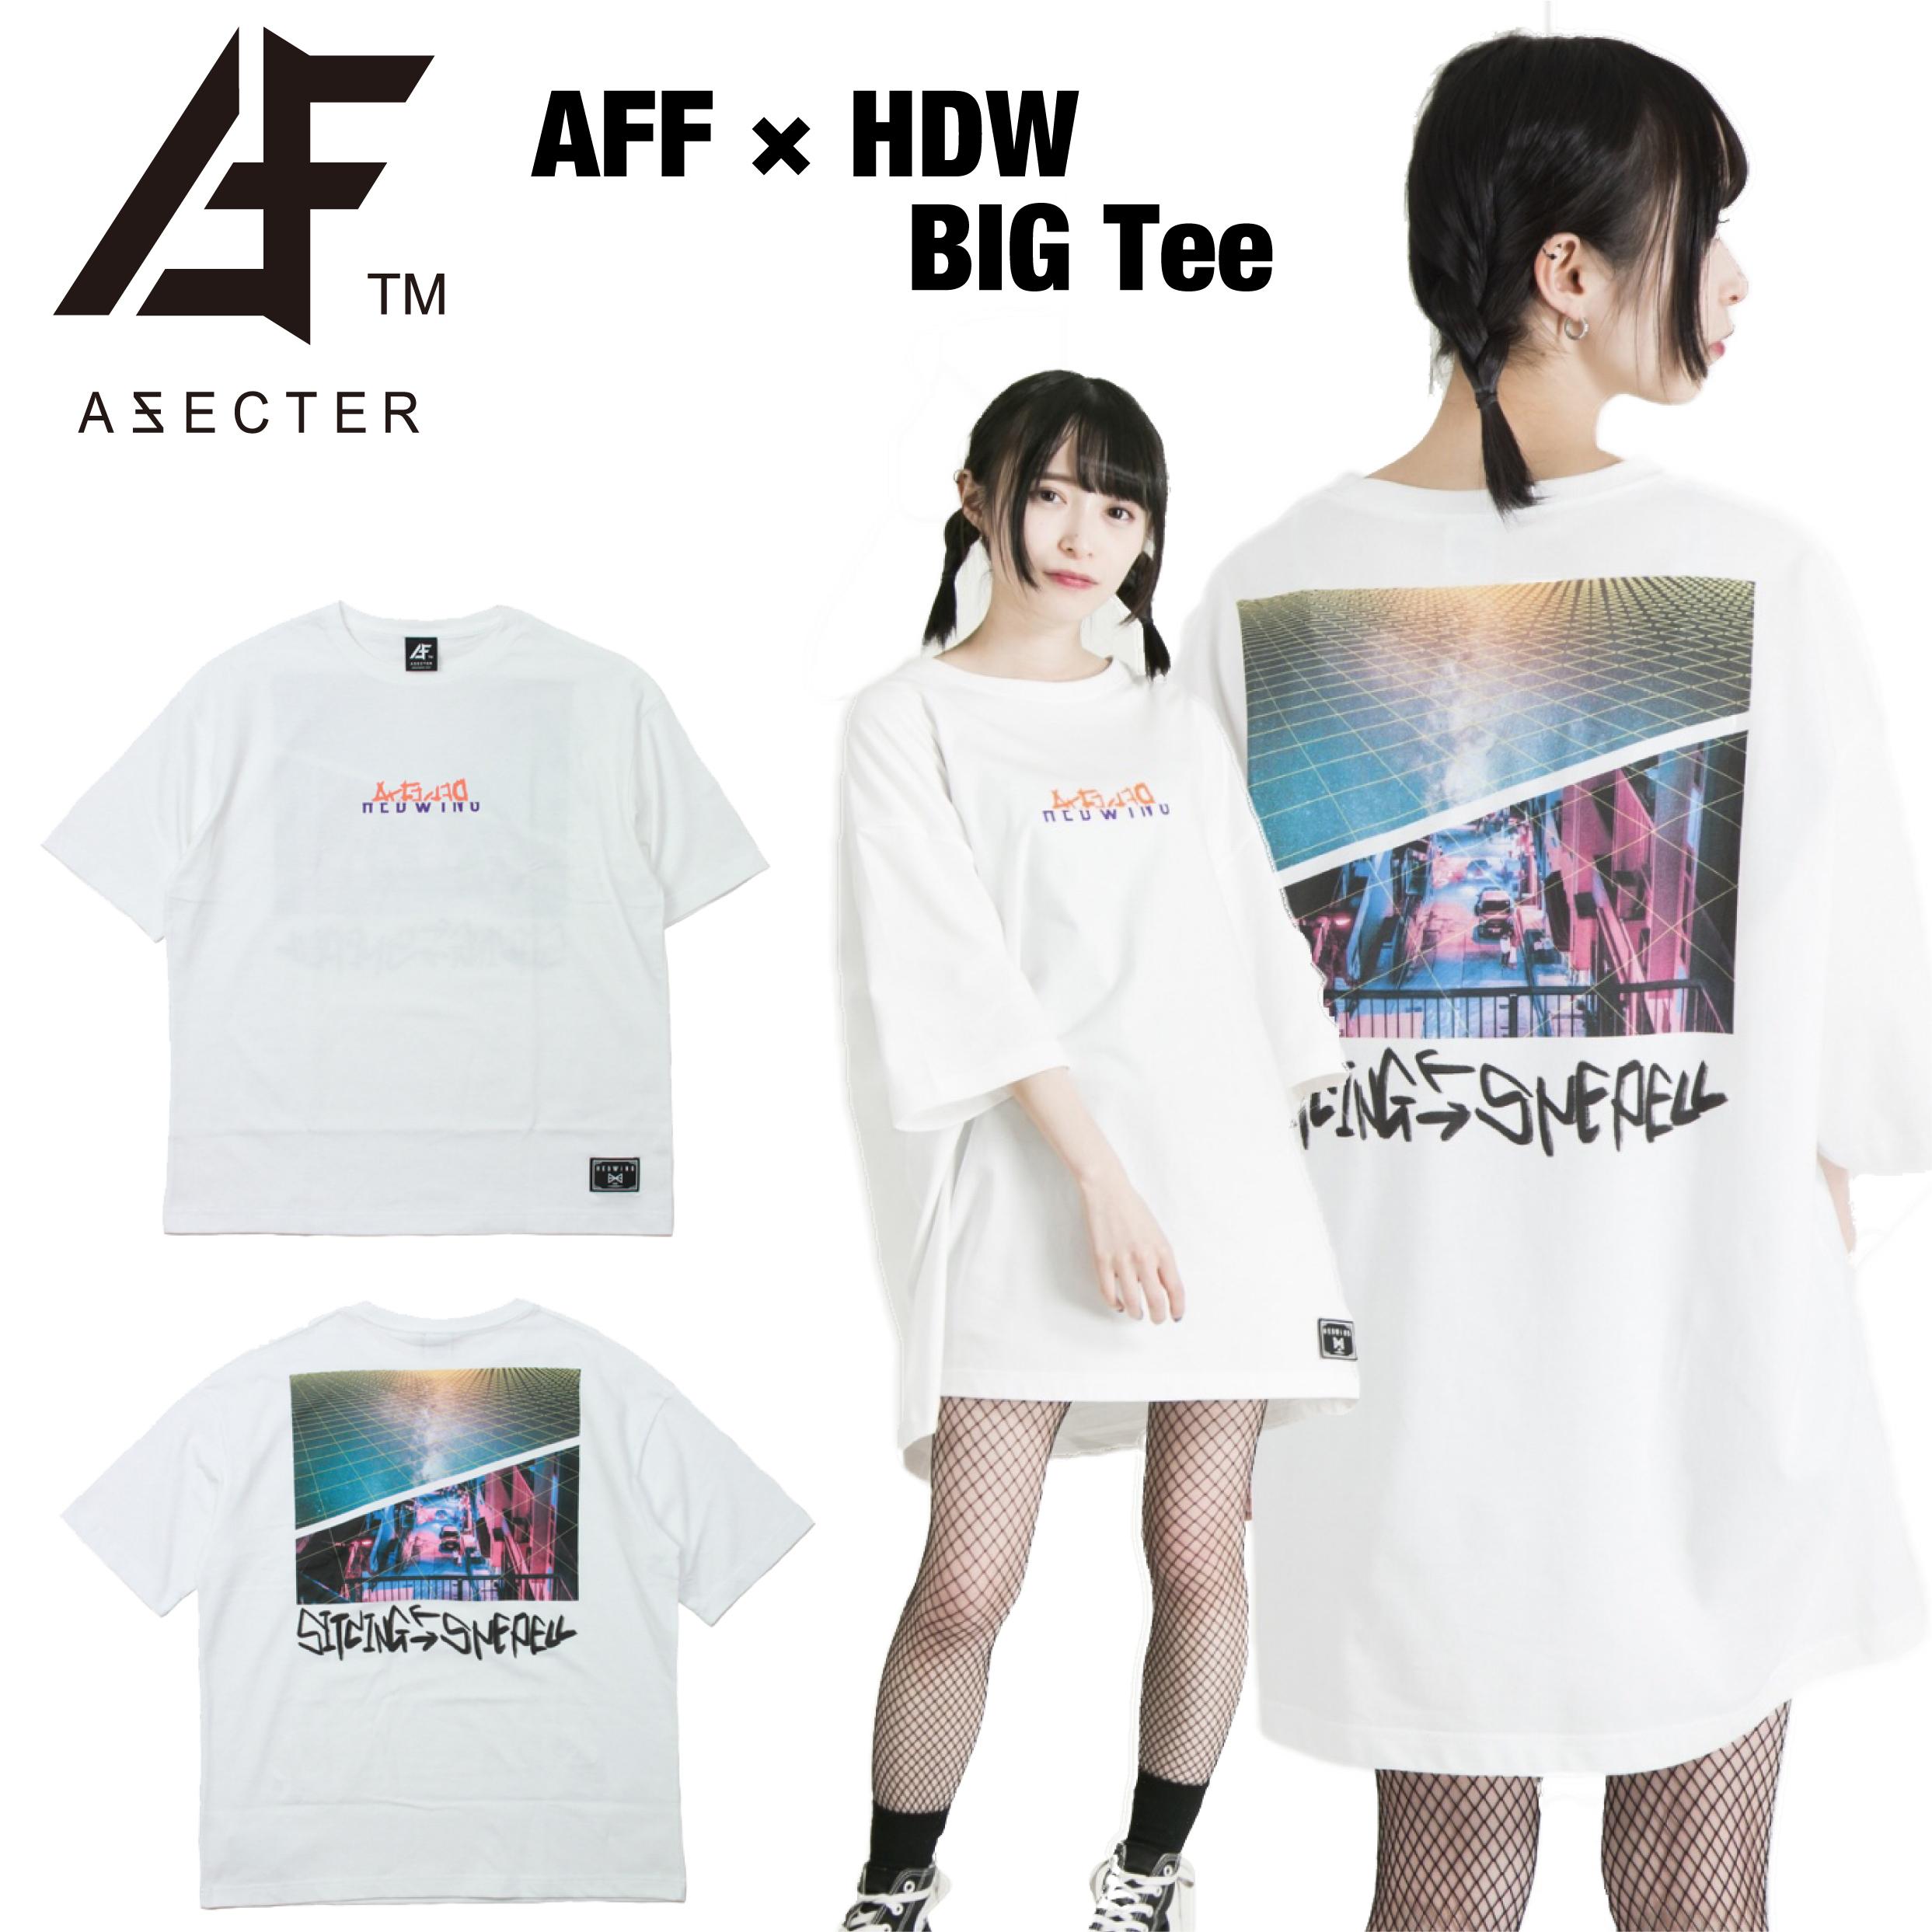 AFFECTER (アフェクター) | AFF × HDW BIG Tee